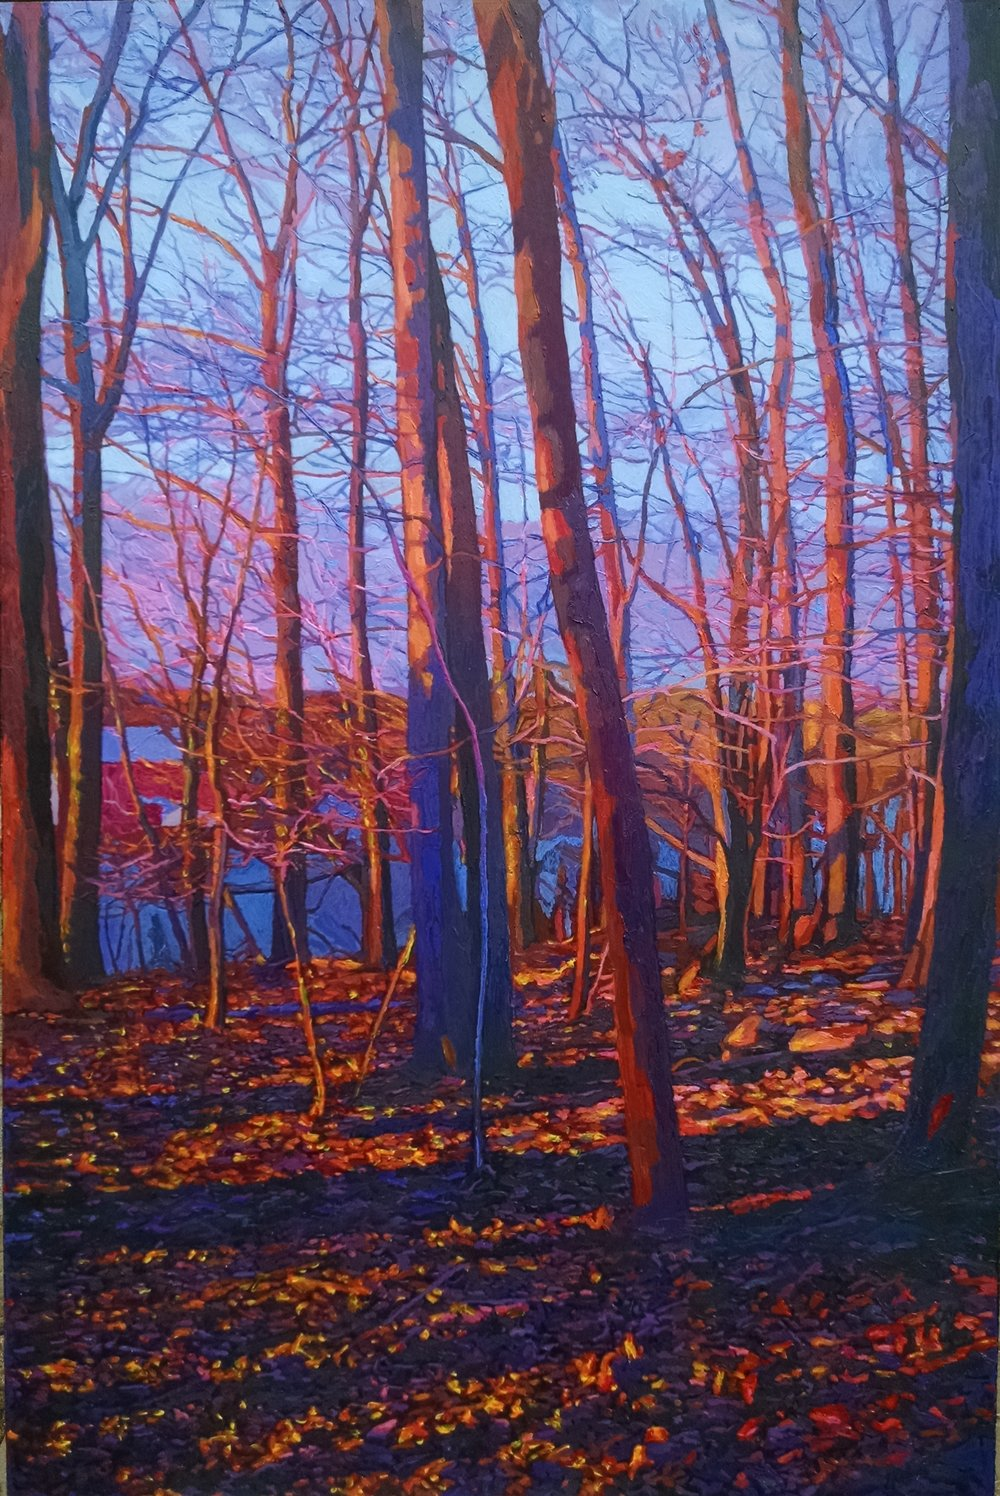 Emily Tarsell, Festival of Trees